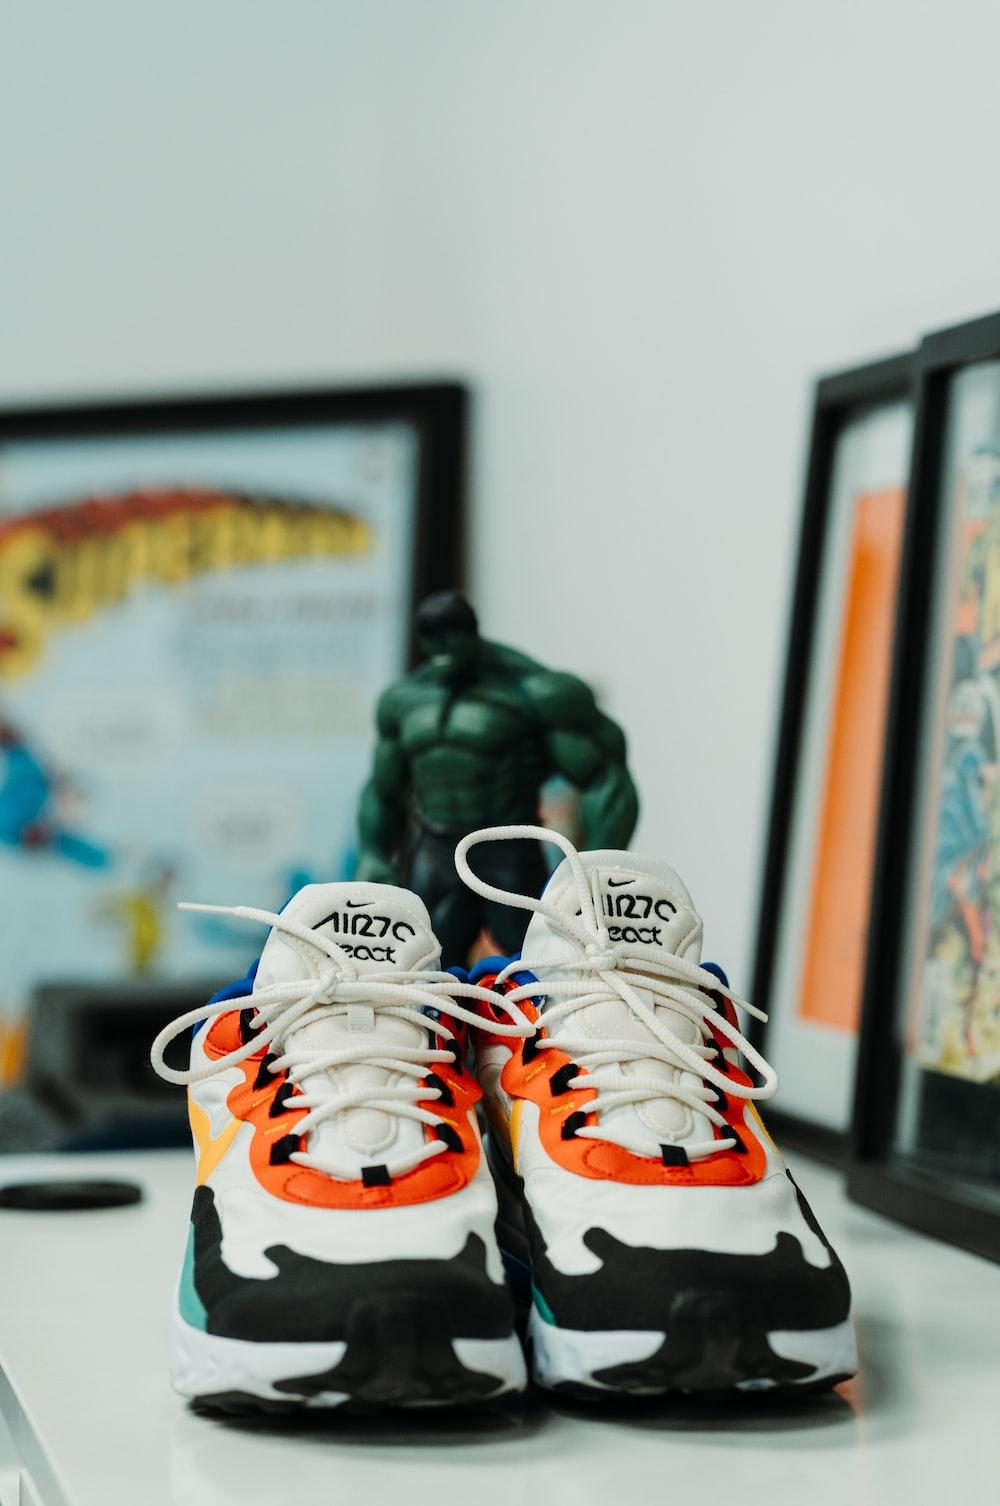 white Nike Air Max 70 shoes photo – Free Apparel Image on Unsplash